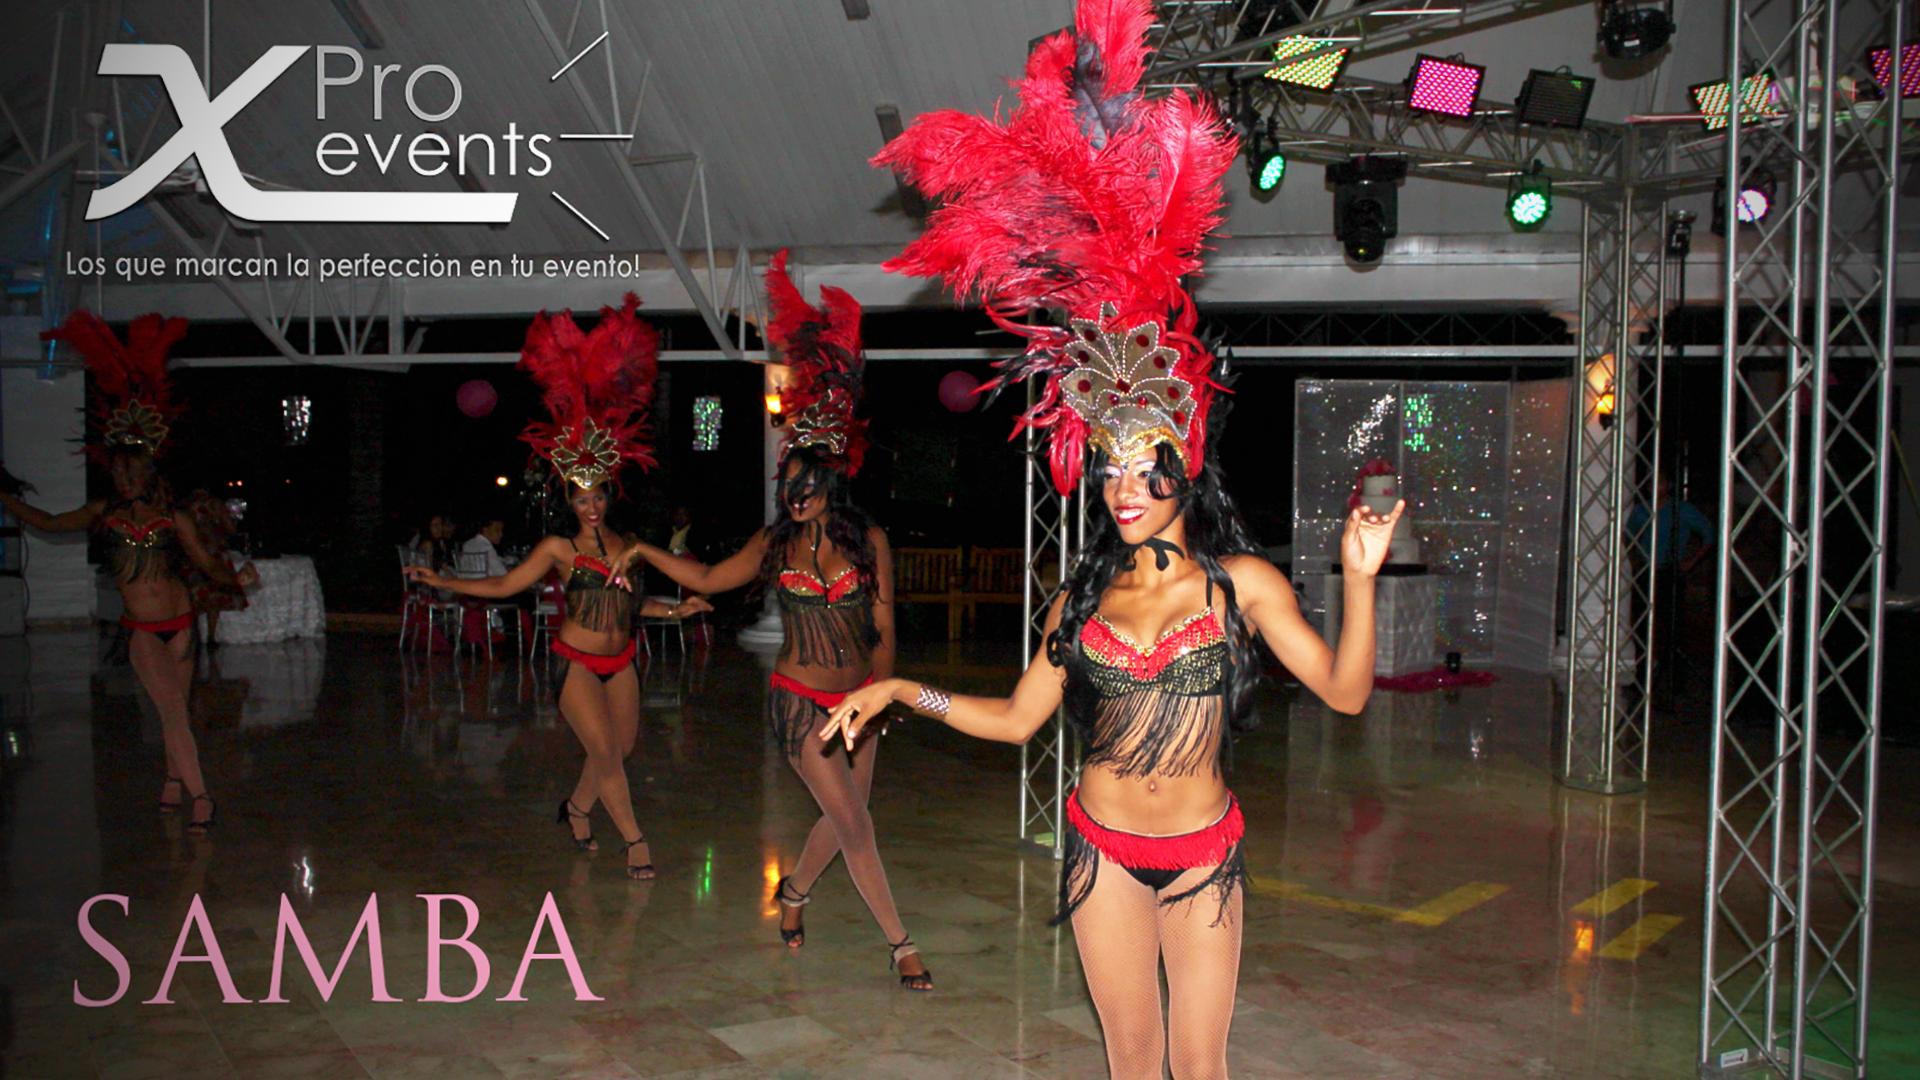 www.Xproevents.com - Bailarinas de Samba para la hora loca.png